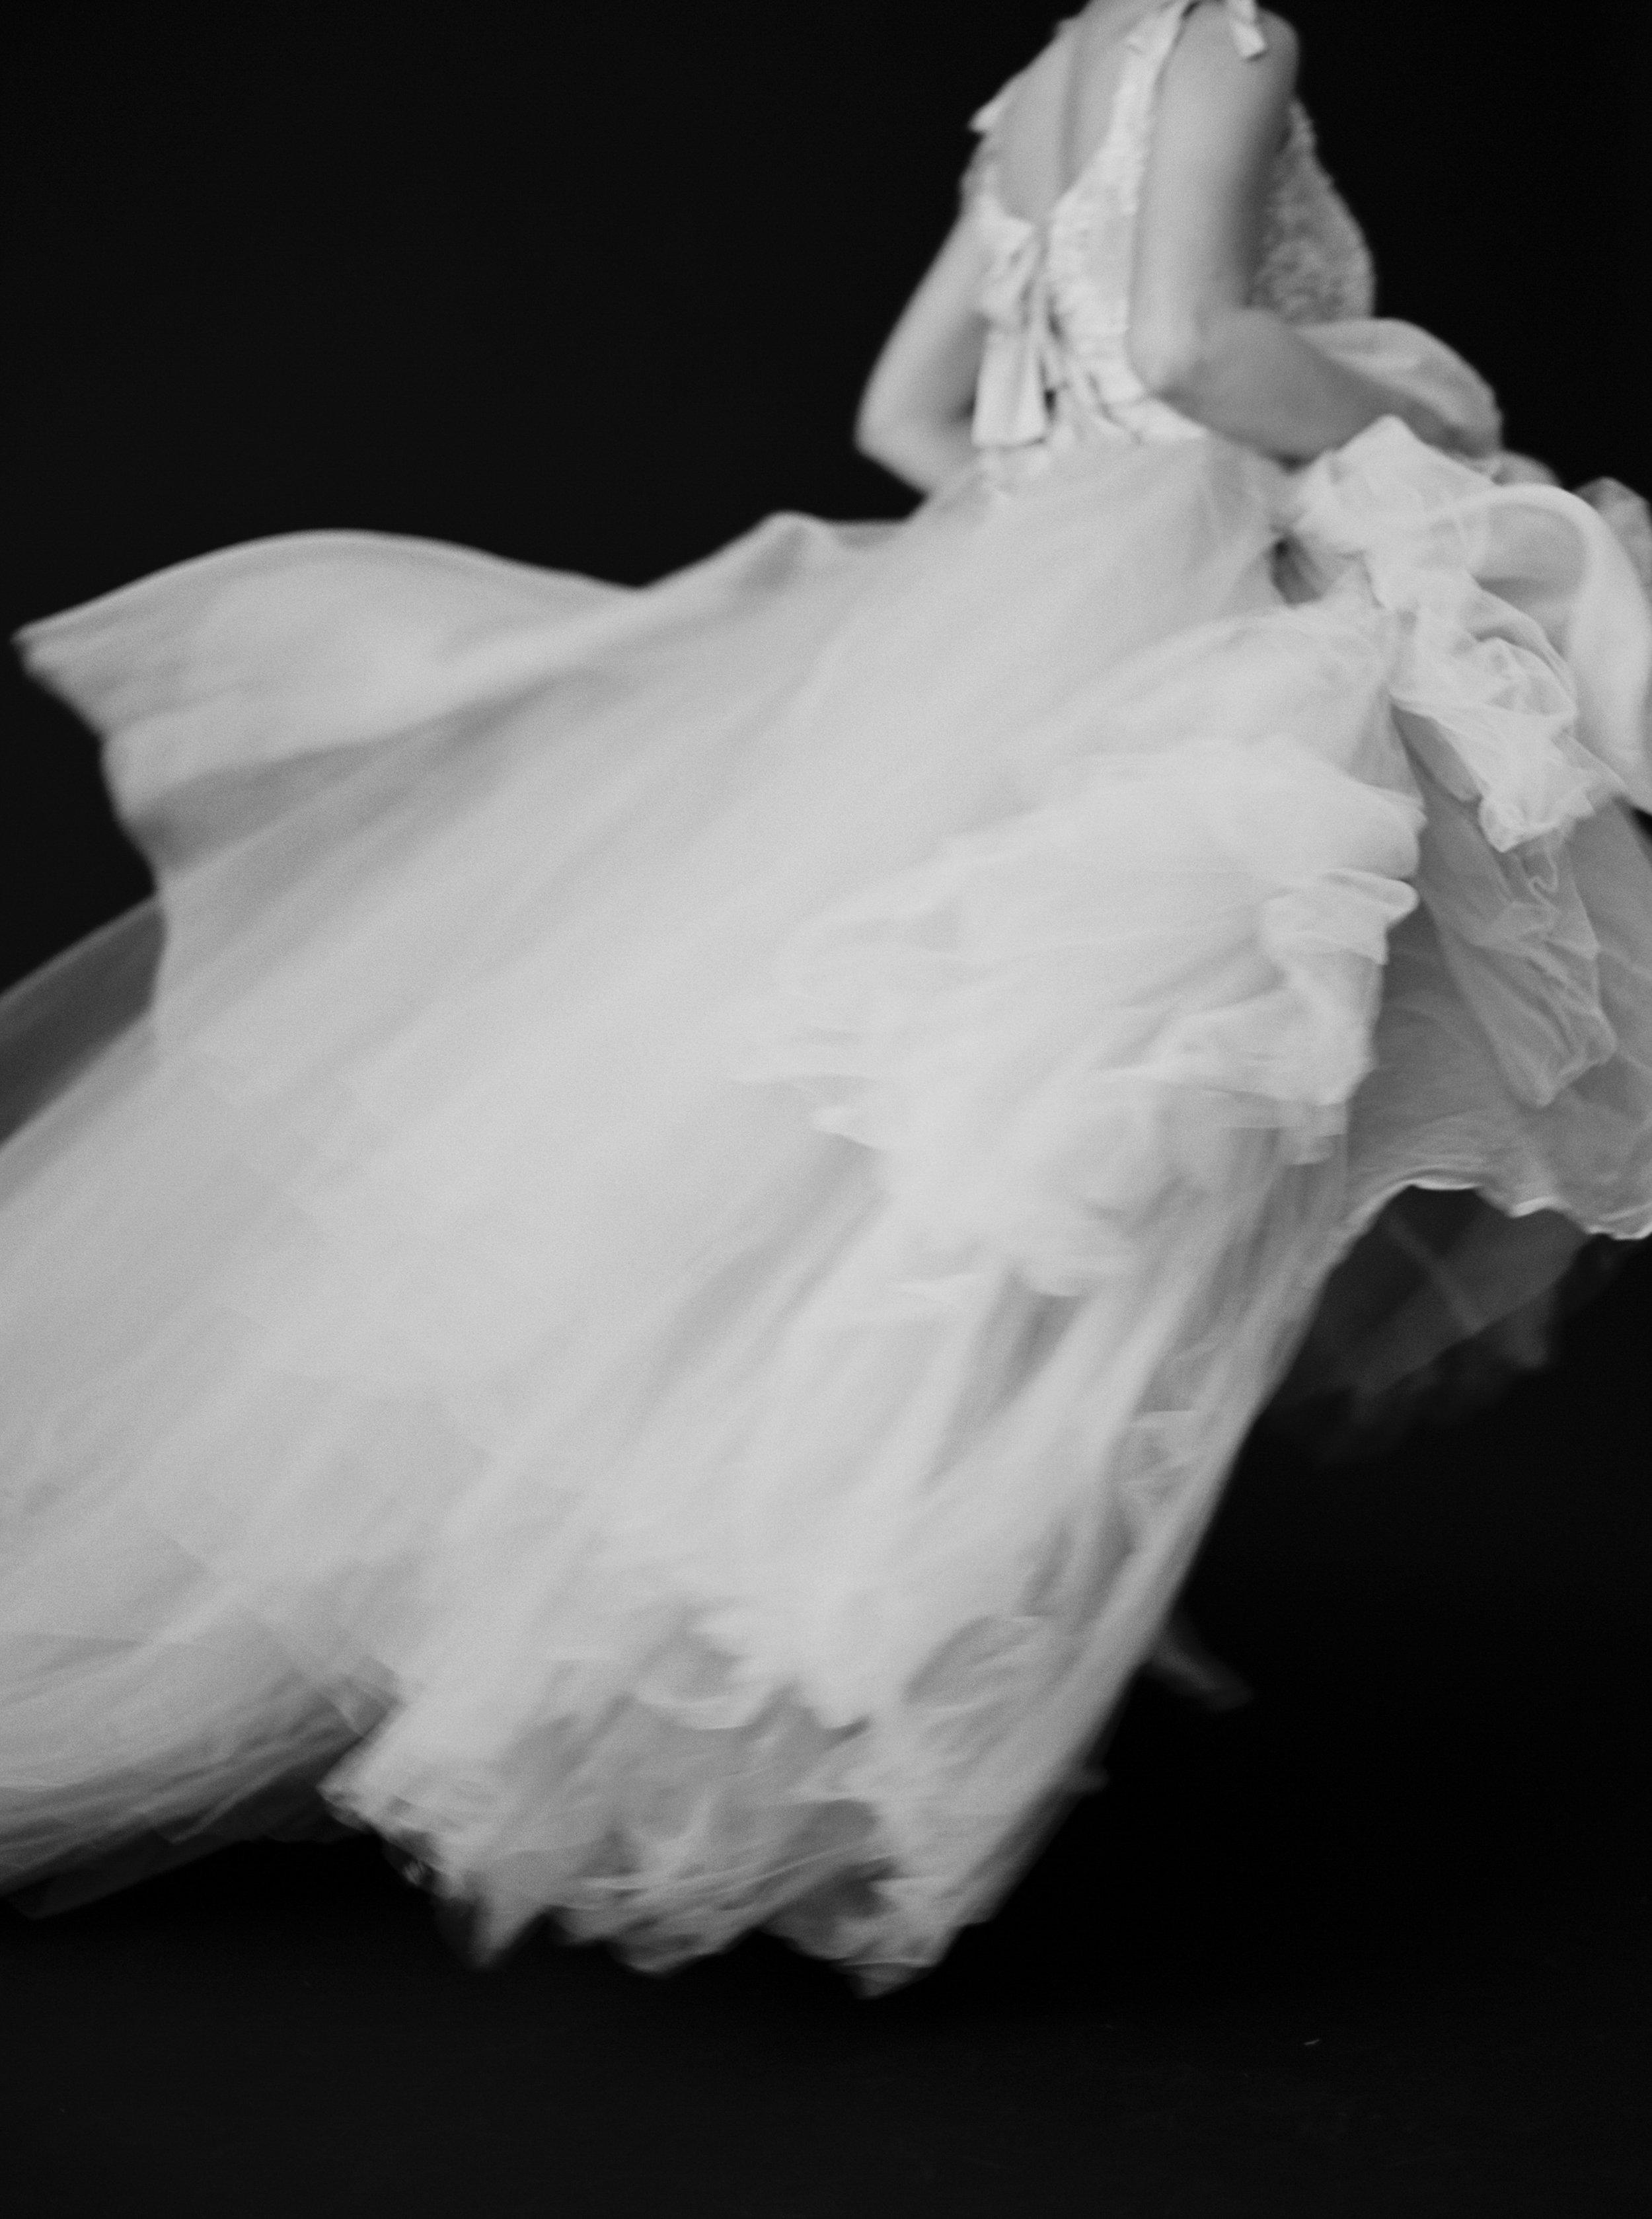 Carlos-Hernandez-Photography-030.jpg